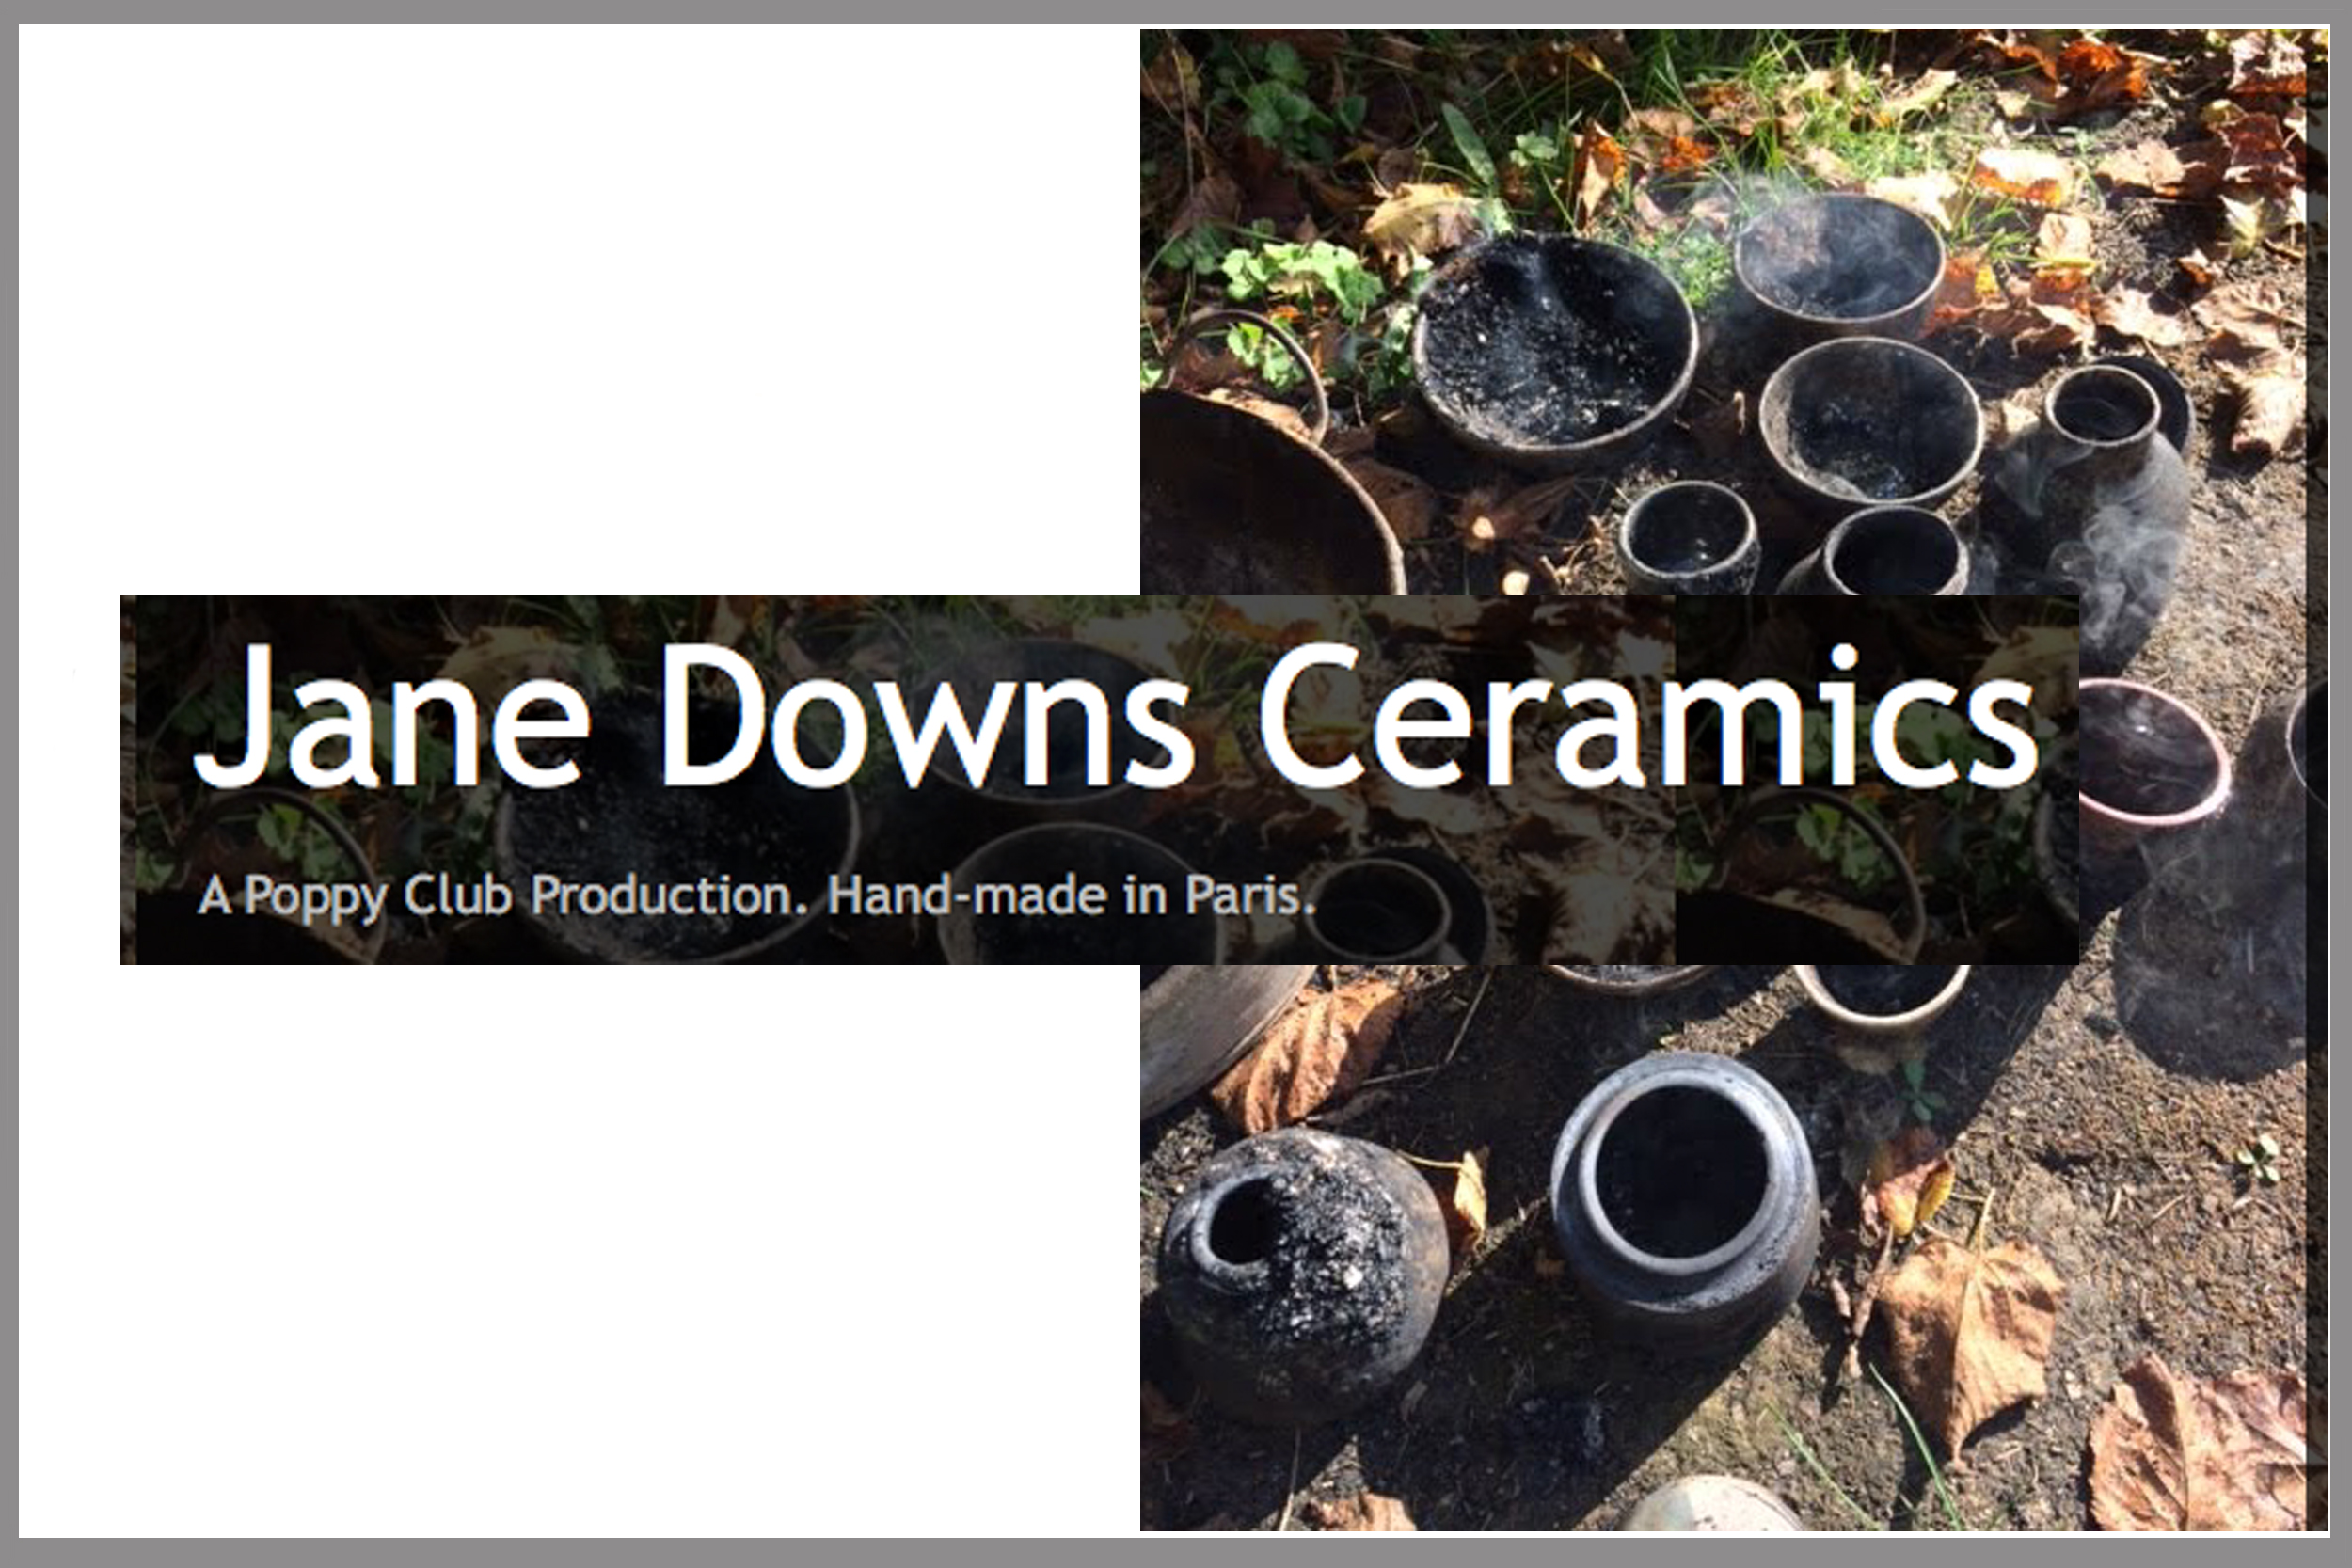 Jane Downs Ceramics